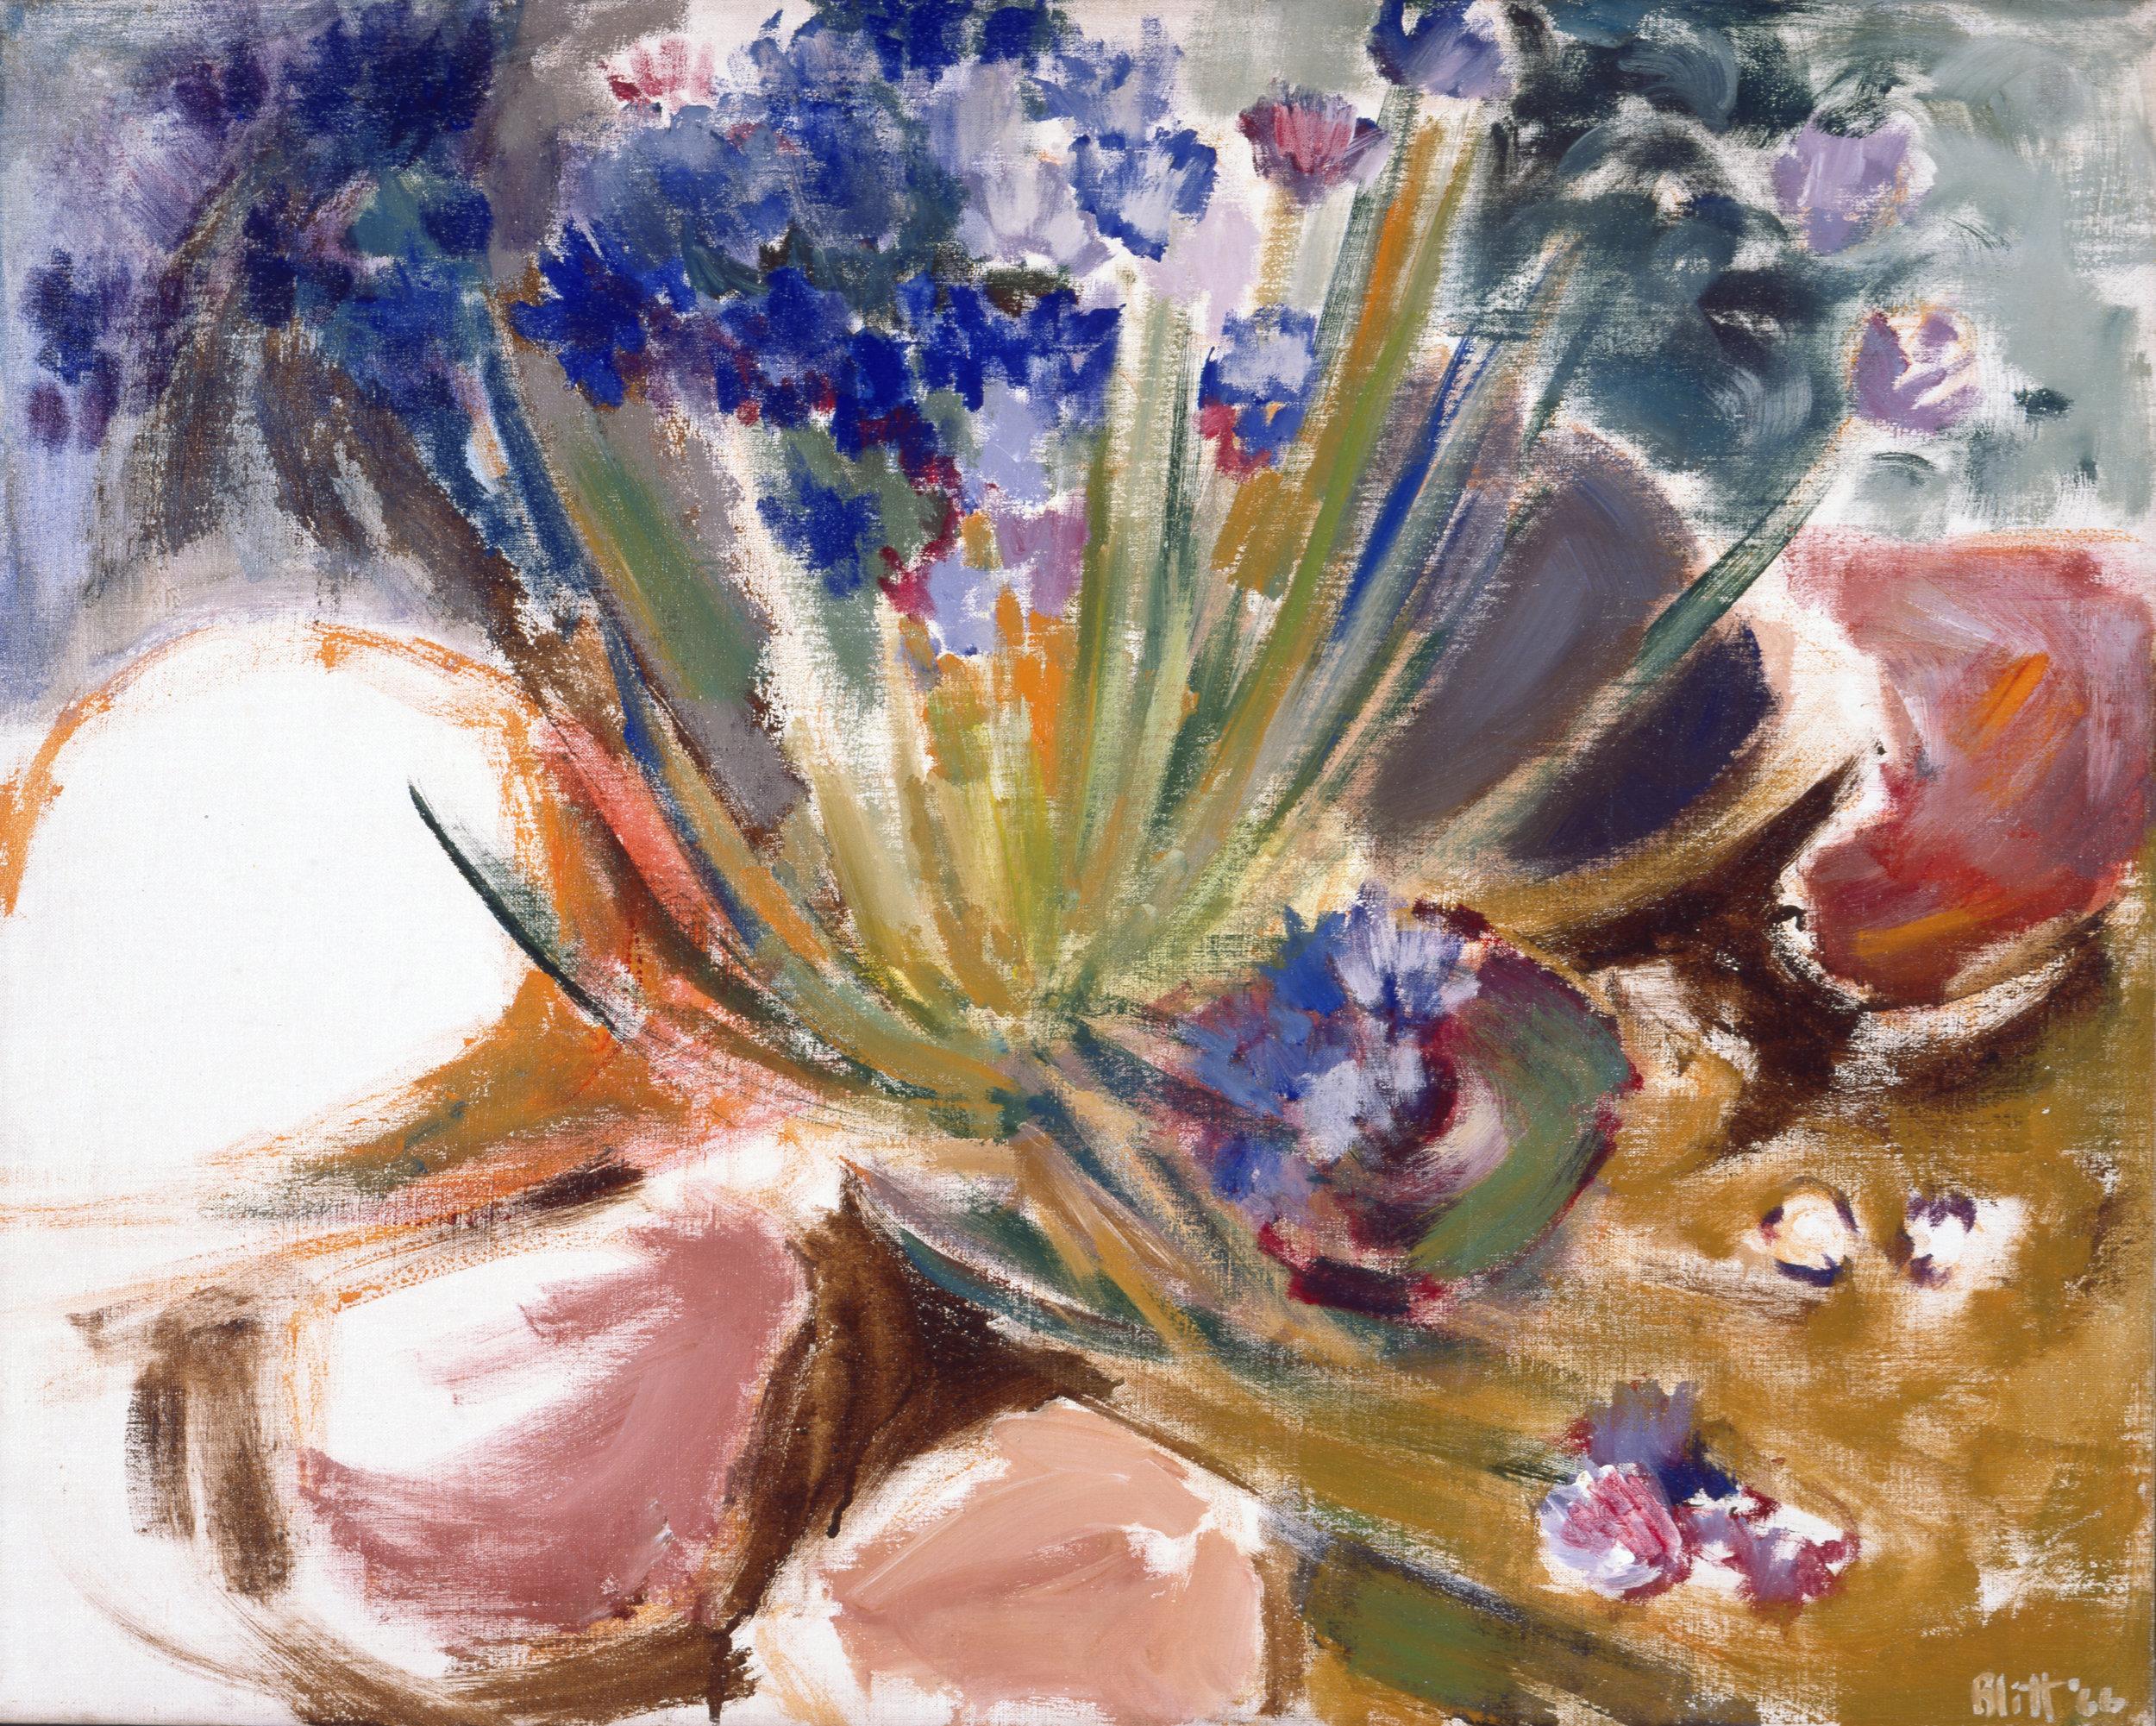 Aspen Hillside  1964, acrylic on canvas, 24x30 in